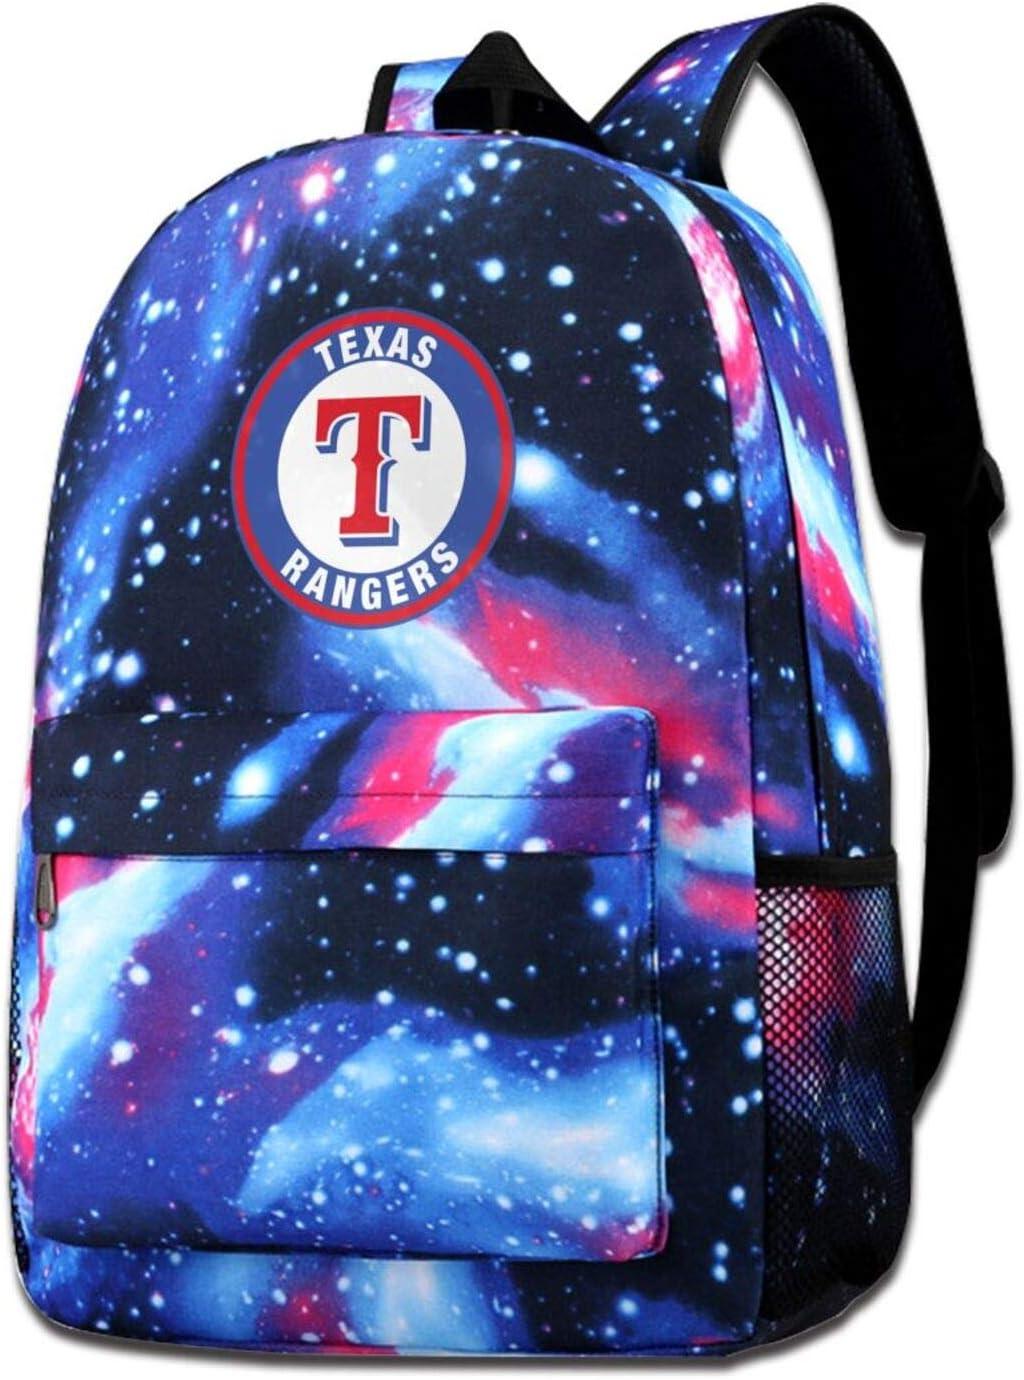 G-III Sports Texas Rangers Backpack Large Capacity Starry Sky School Bag Casual Daypack Shoulder Bag for Men Women Boys Girls Teen